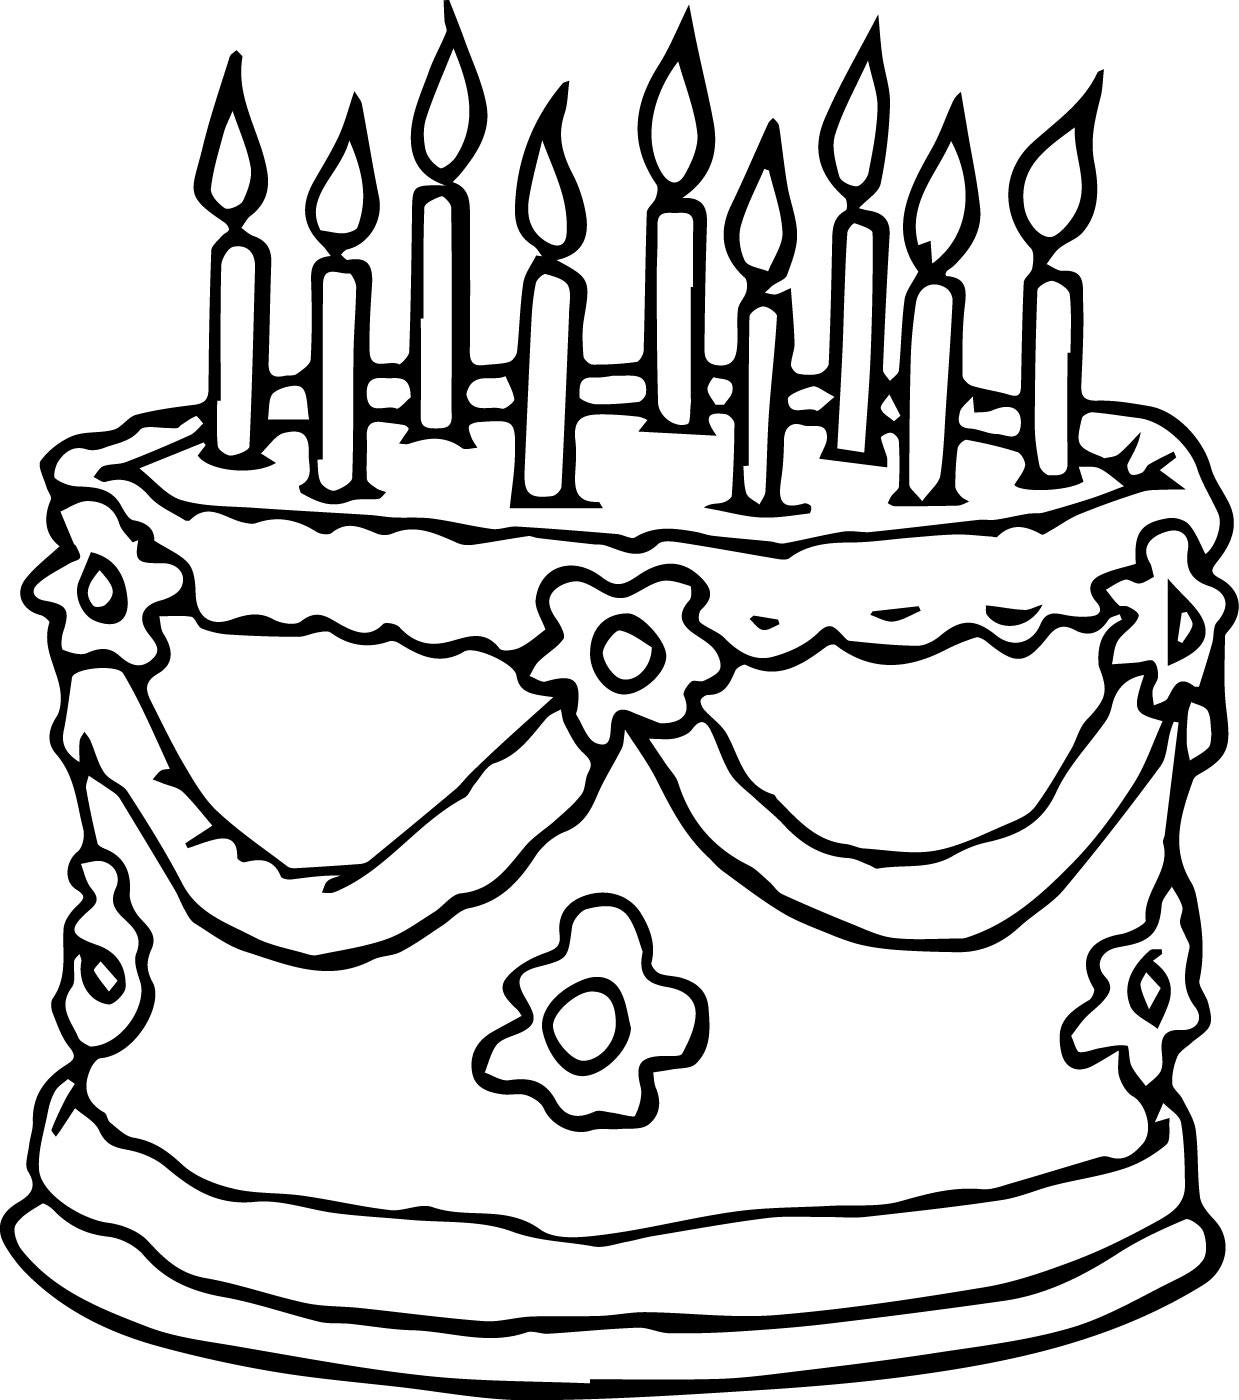 1239x1400 Wedding Birthday Cake Coloring Page Wecoloringpage